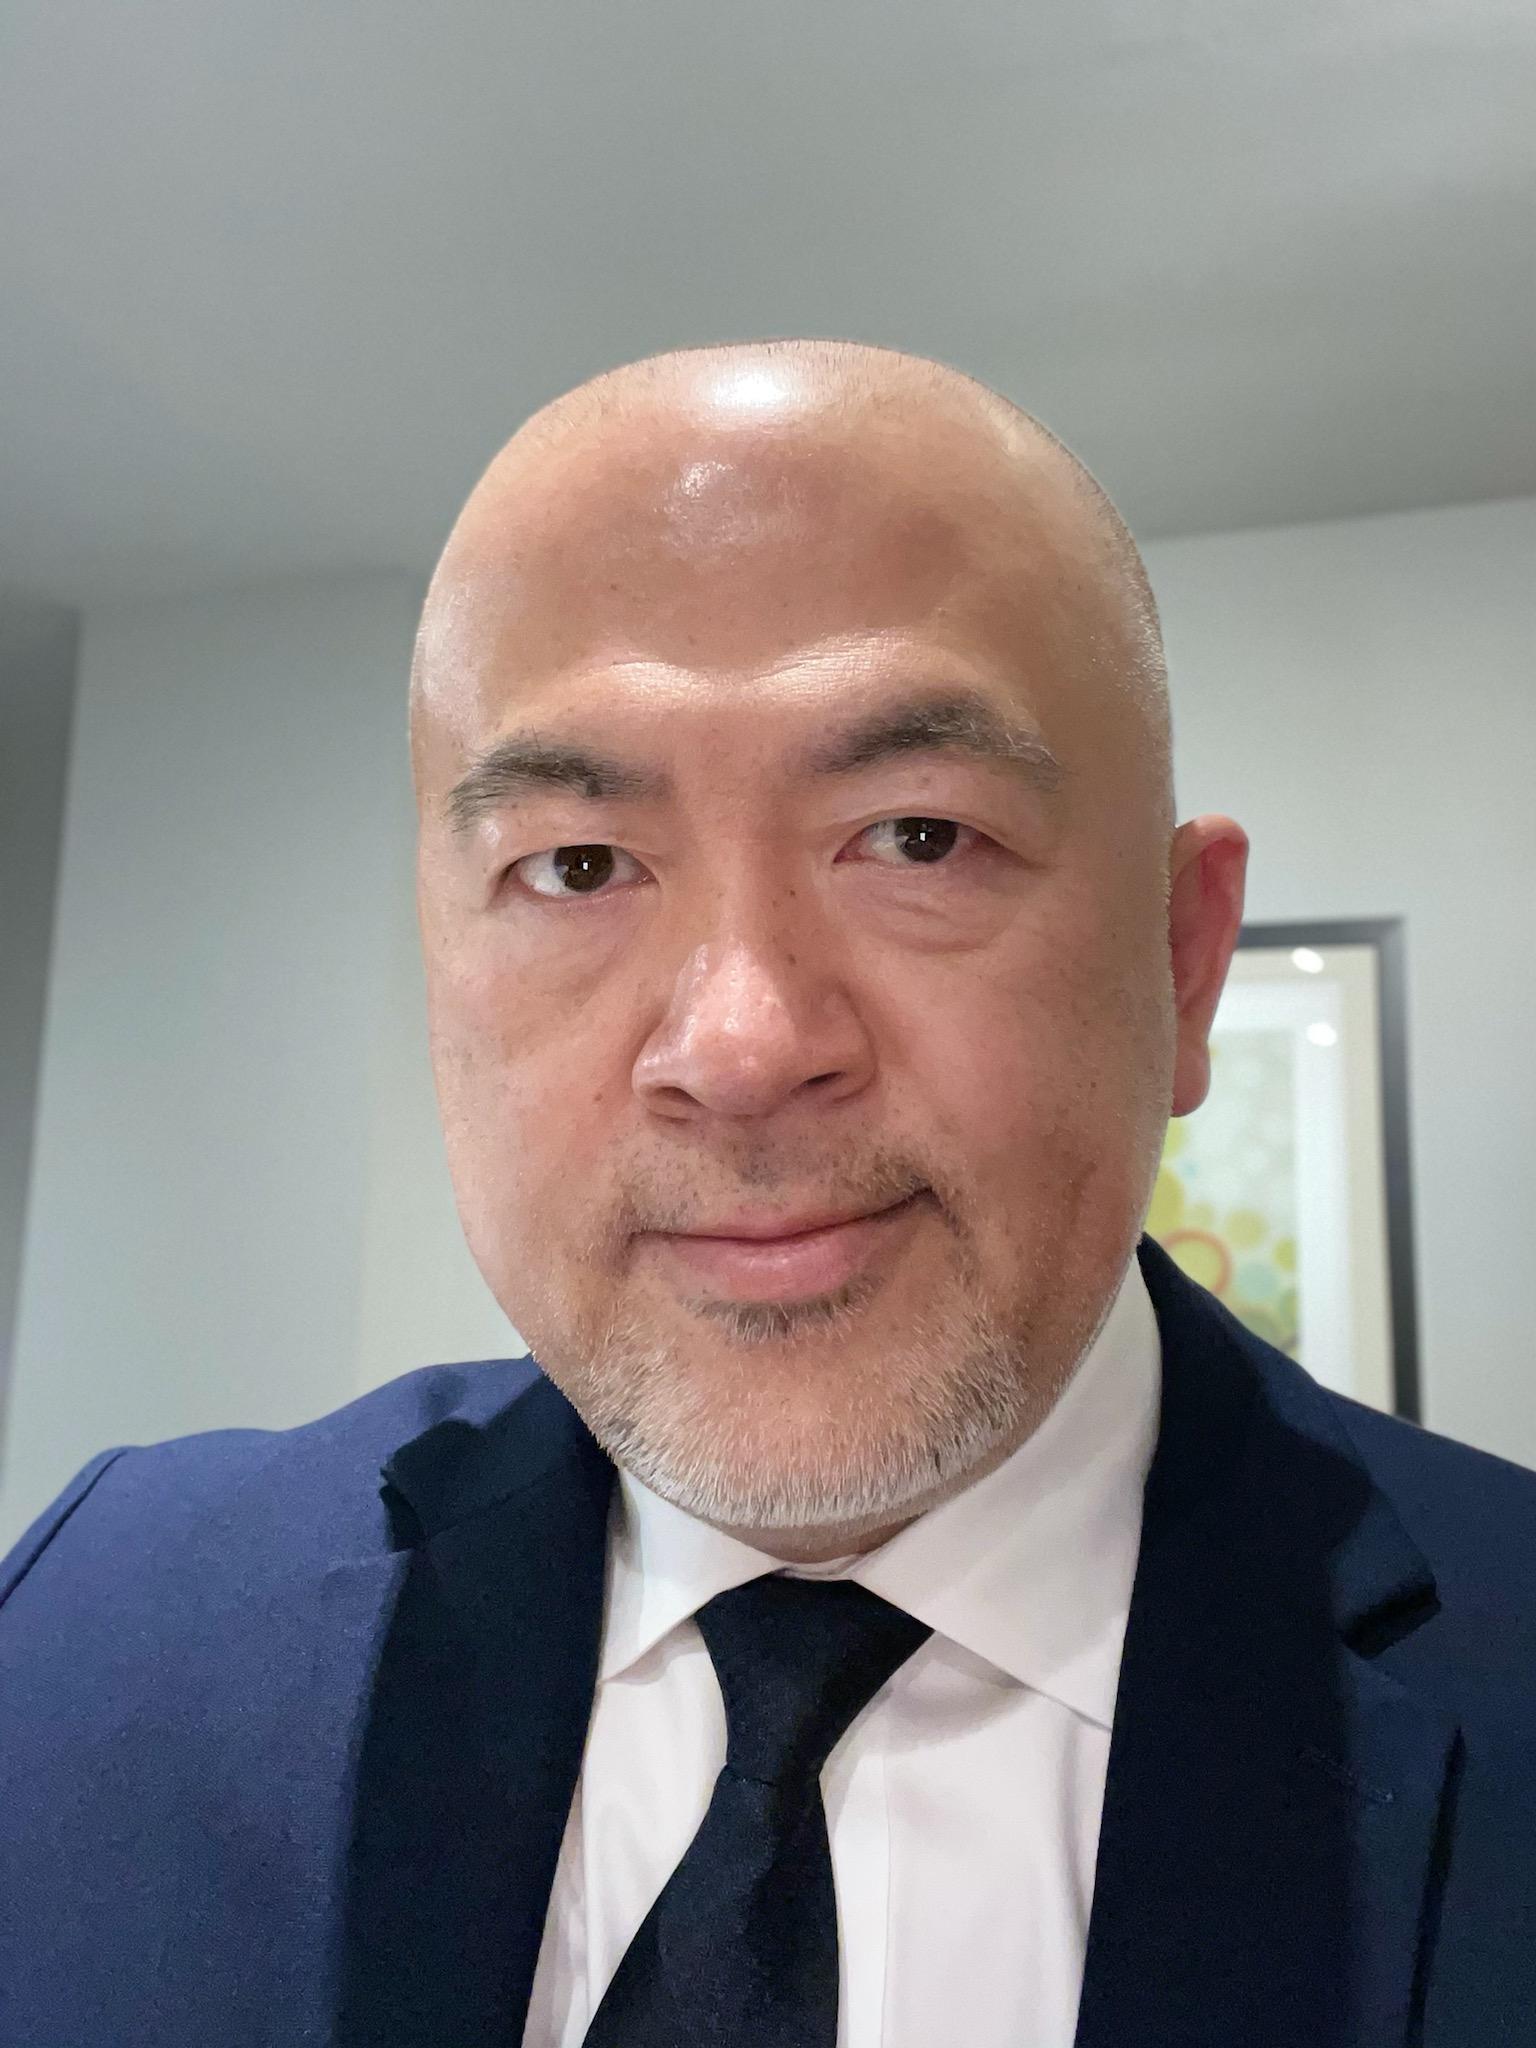 Jun Inomata as Director, Warehouse Operations - Pharma & Healthcare